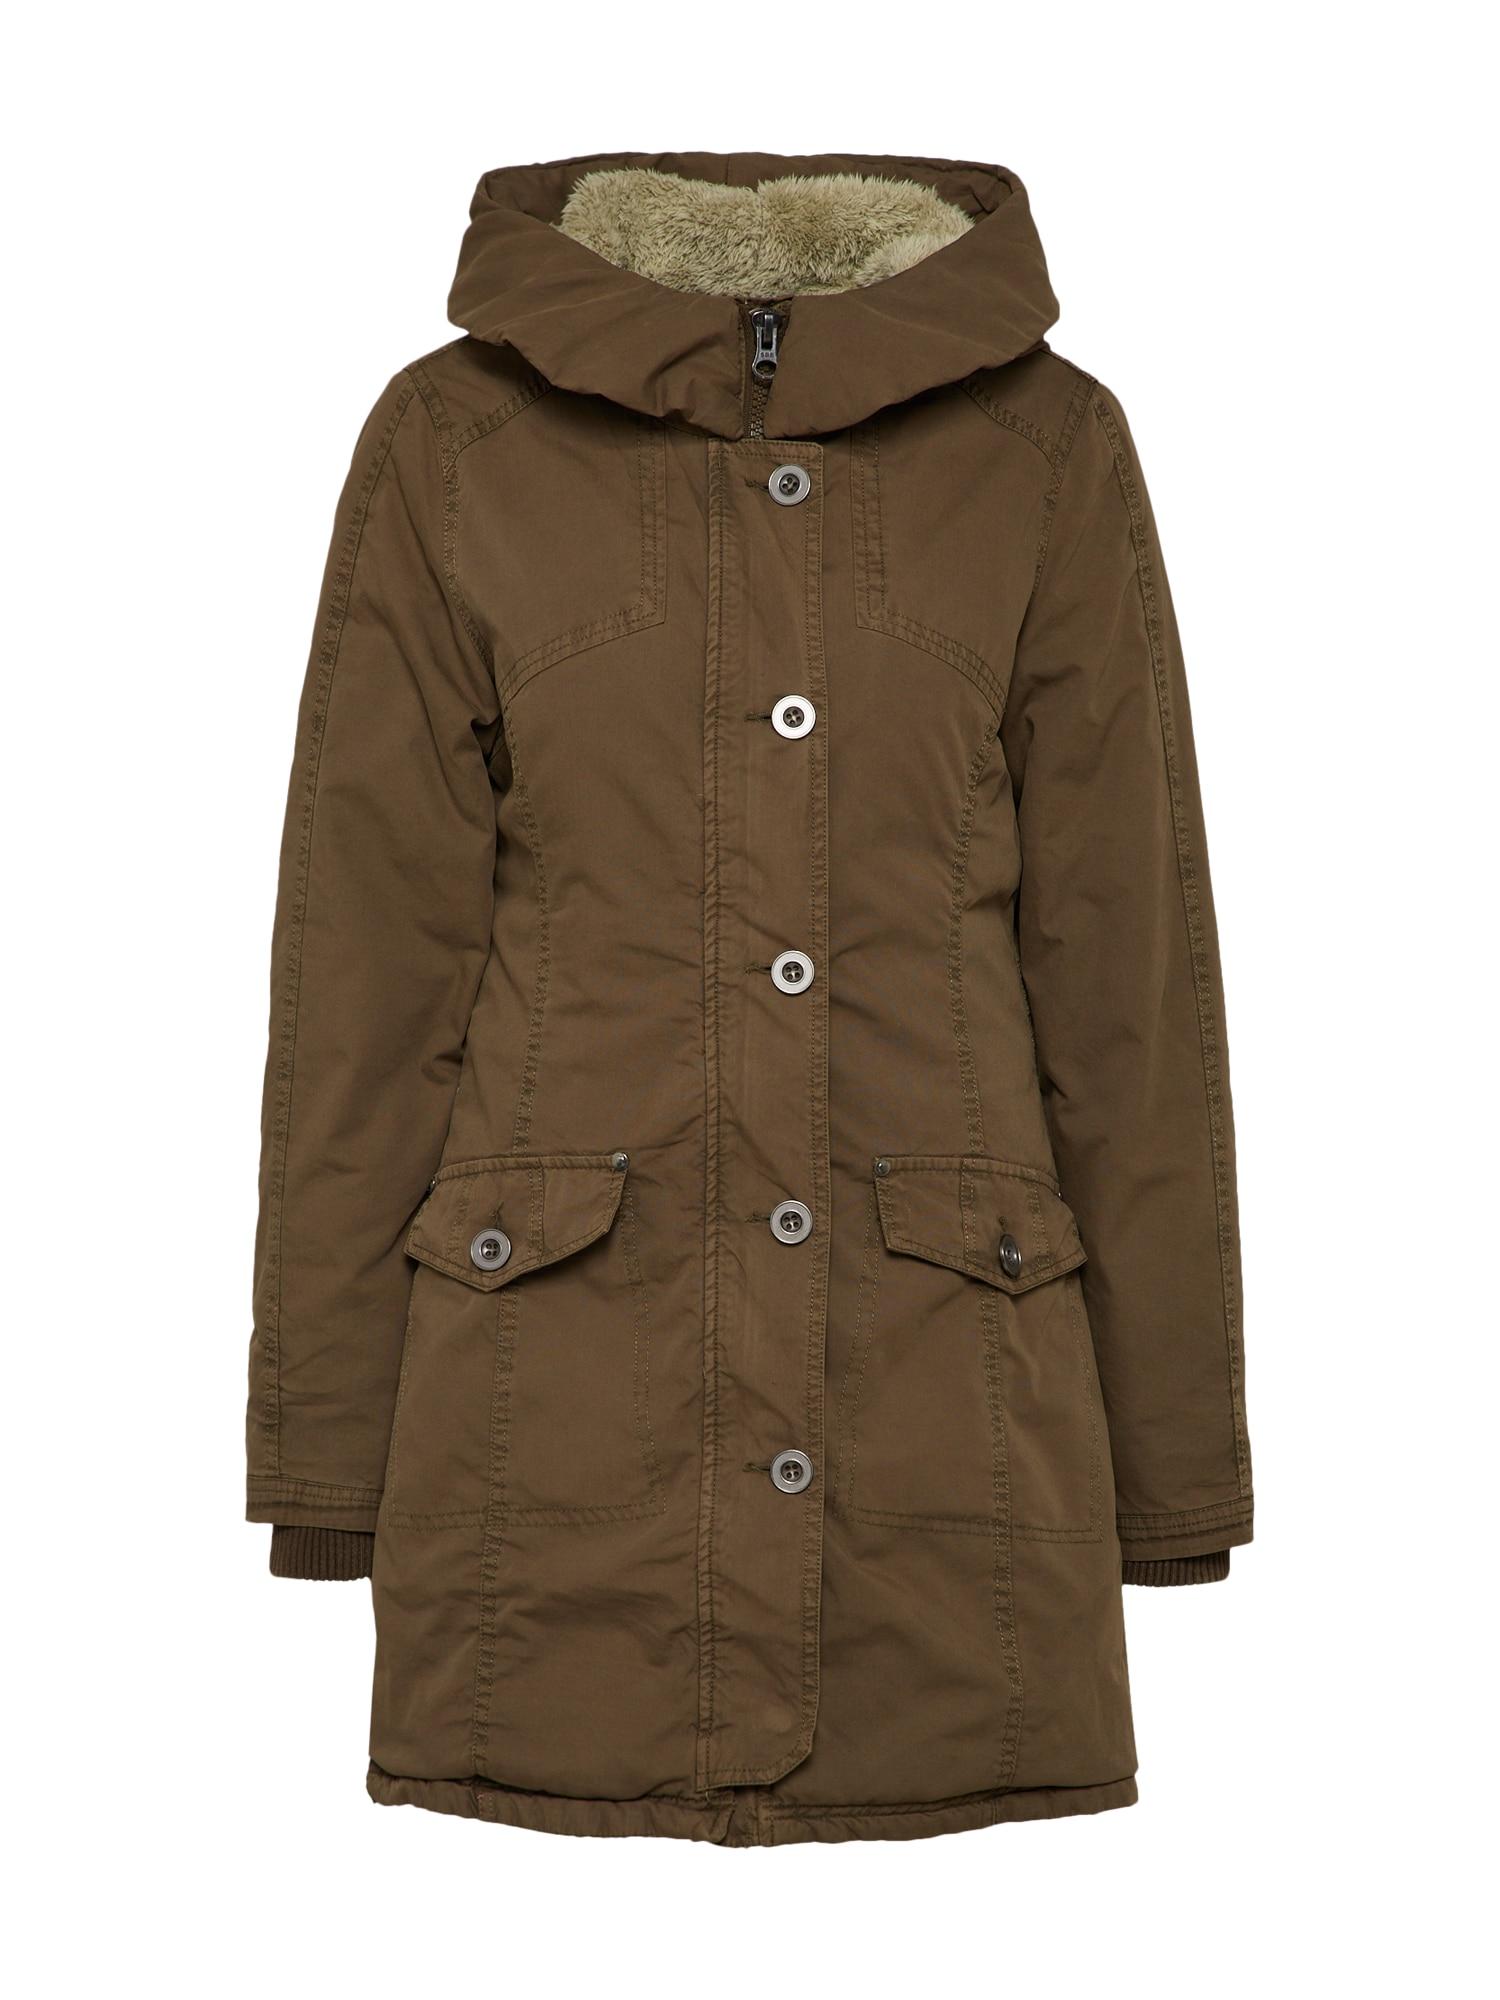 Zimní parka Ladies Garment Washed Long olivová Urban Classics